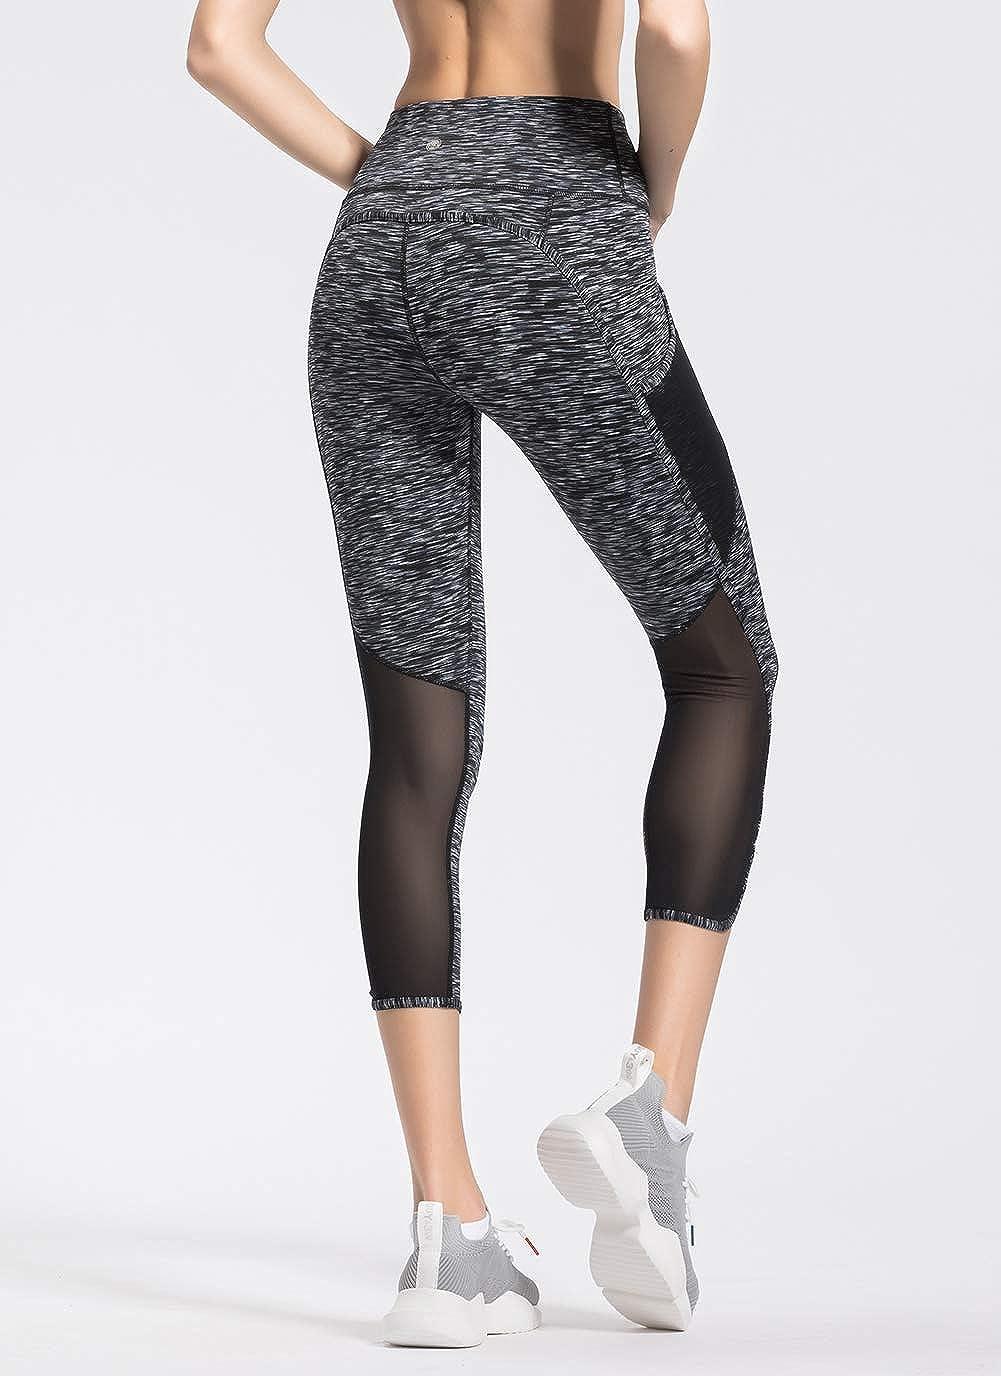 QUEENIEKE Women 22 Yoga Mid-Waist 3 Pocket Running Pants Trousers Workout Tights Legging70910